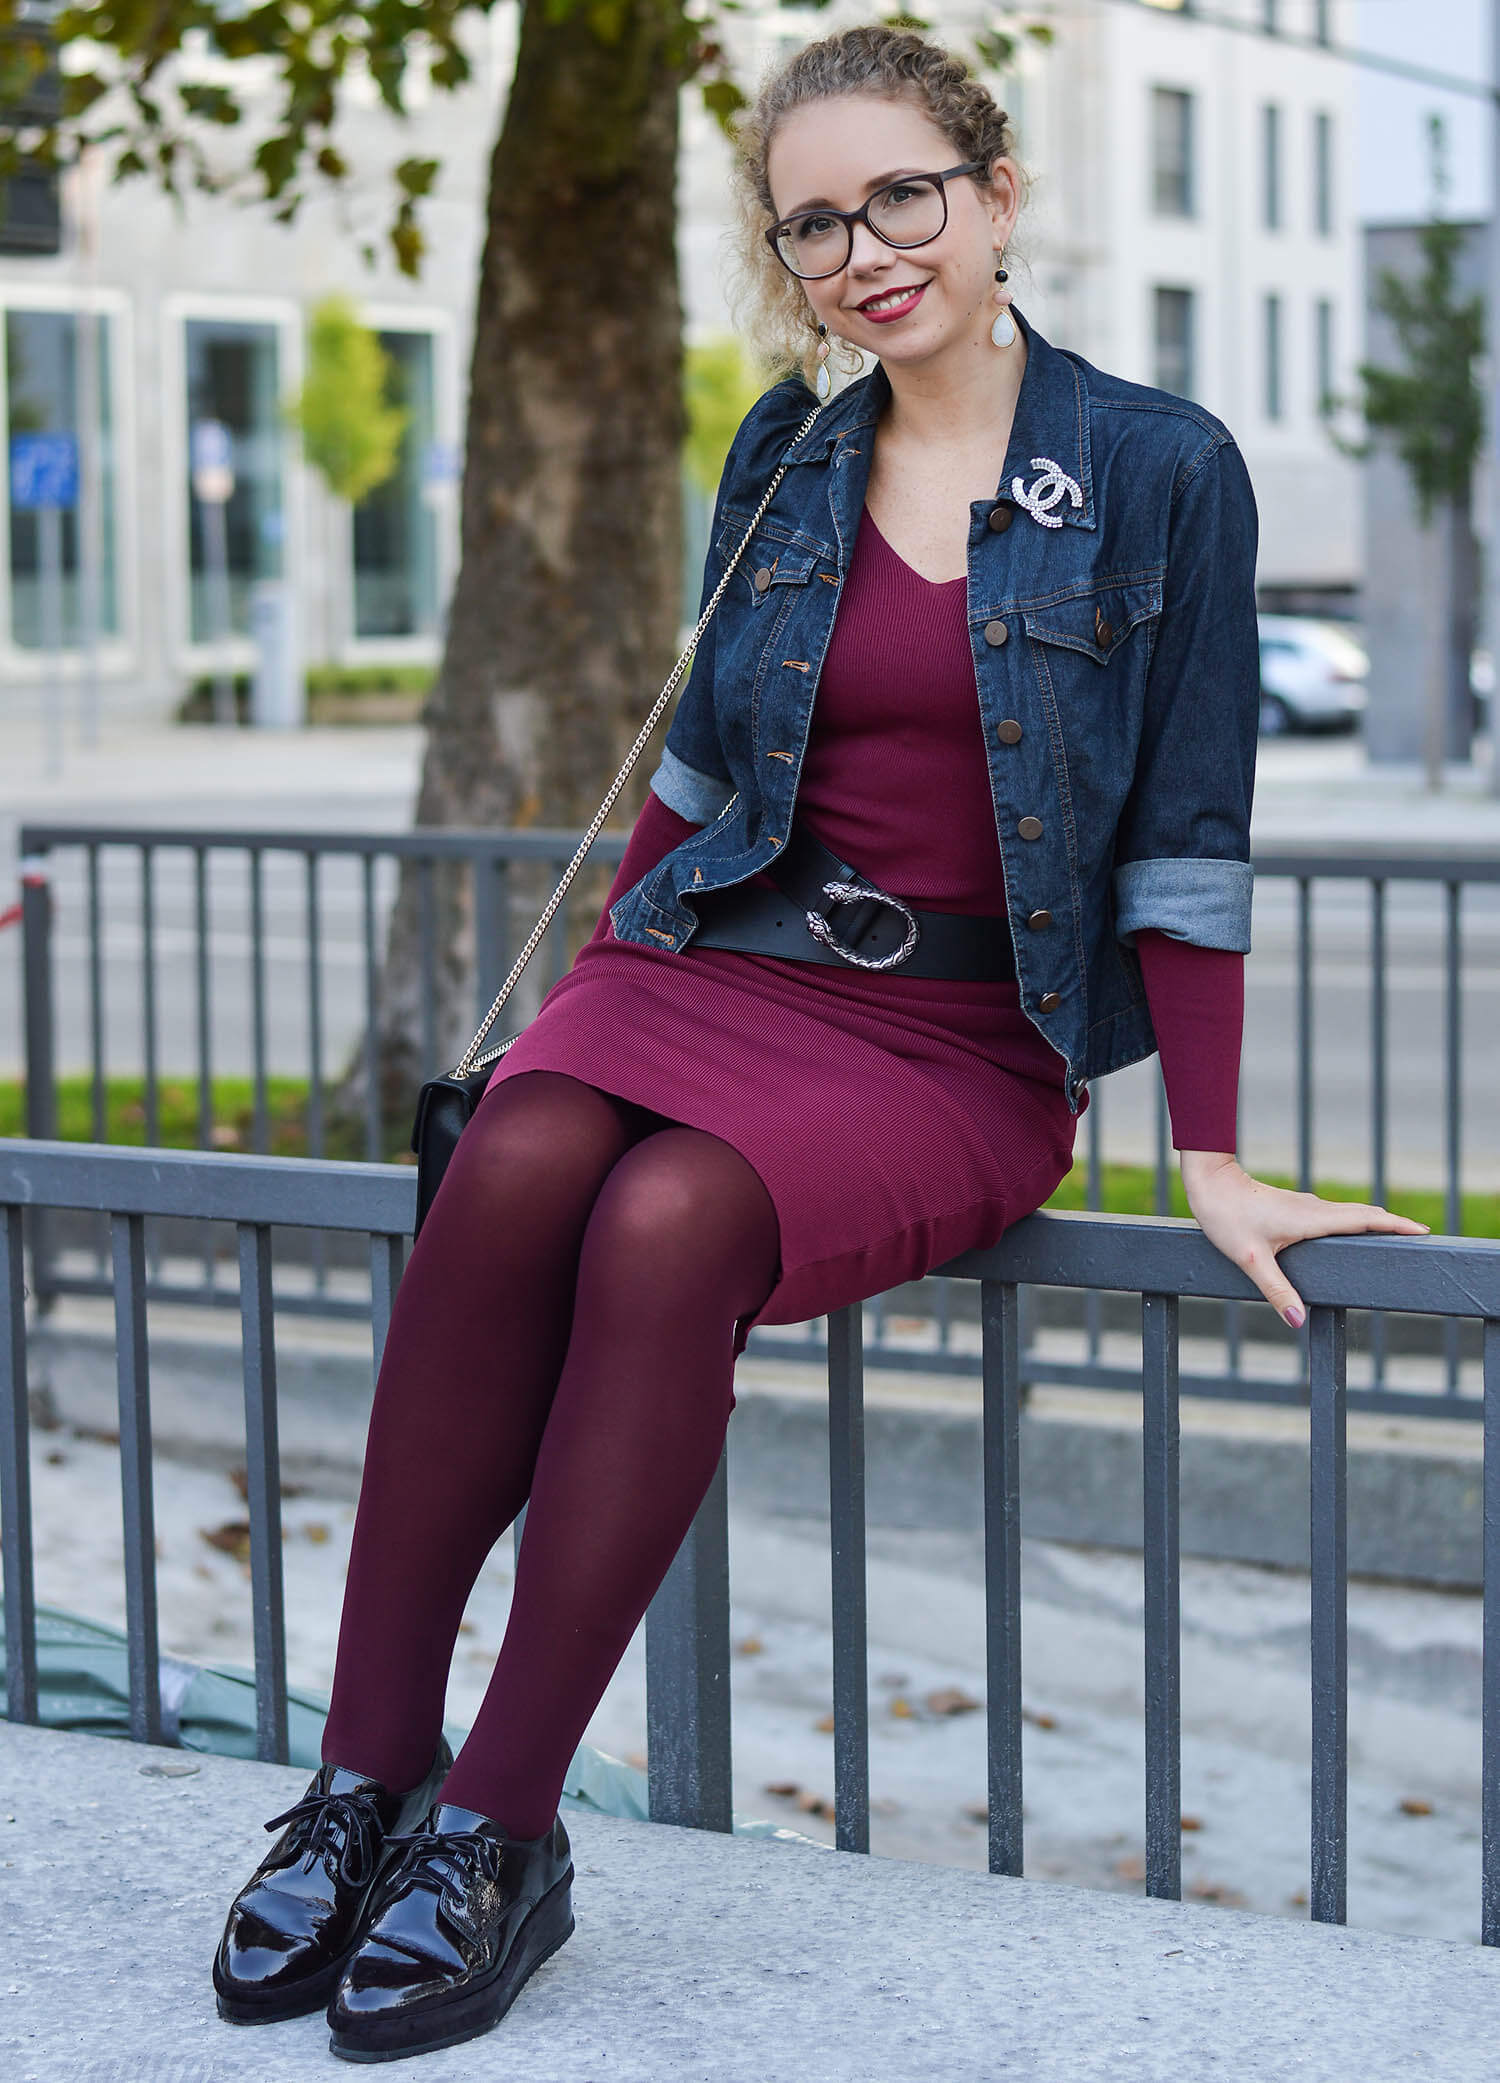 Kationette-fashionblogger-nrw-Outfit-Burgundy-Fall-Dress-Denim-Jacket-and-Platform-Shoes